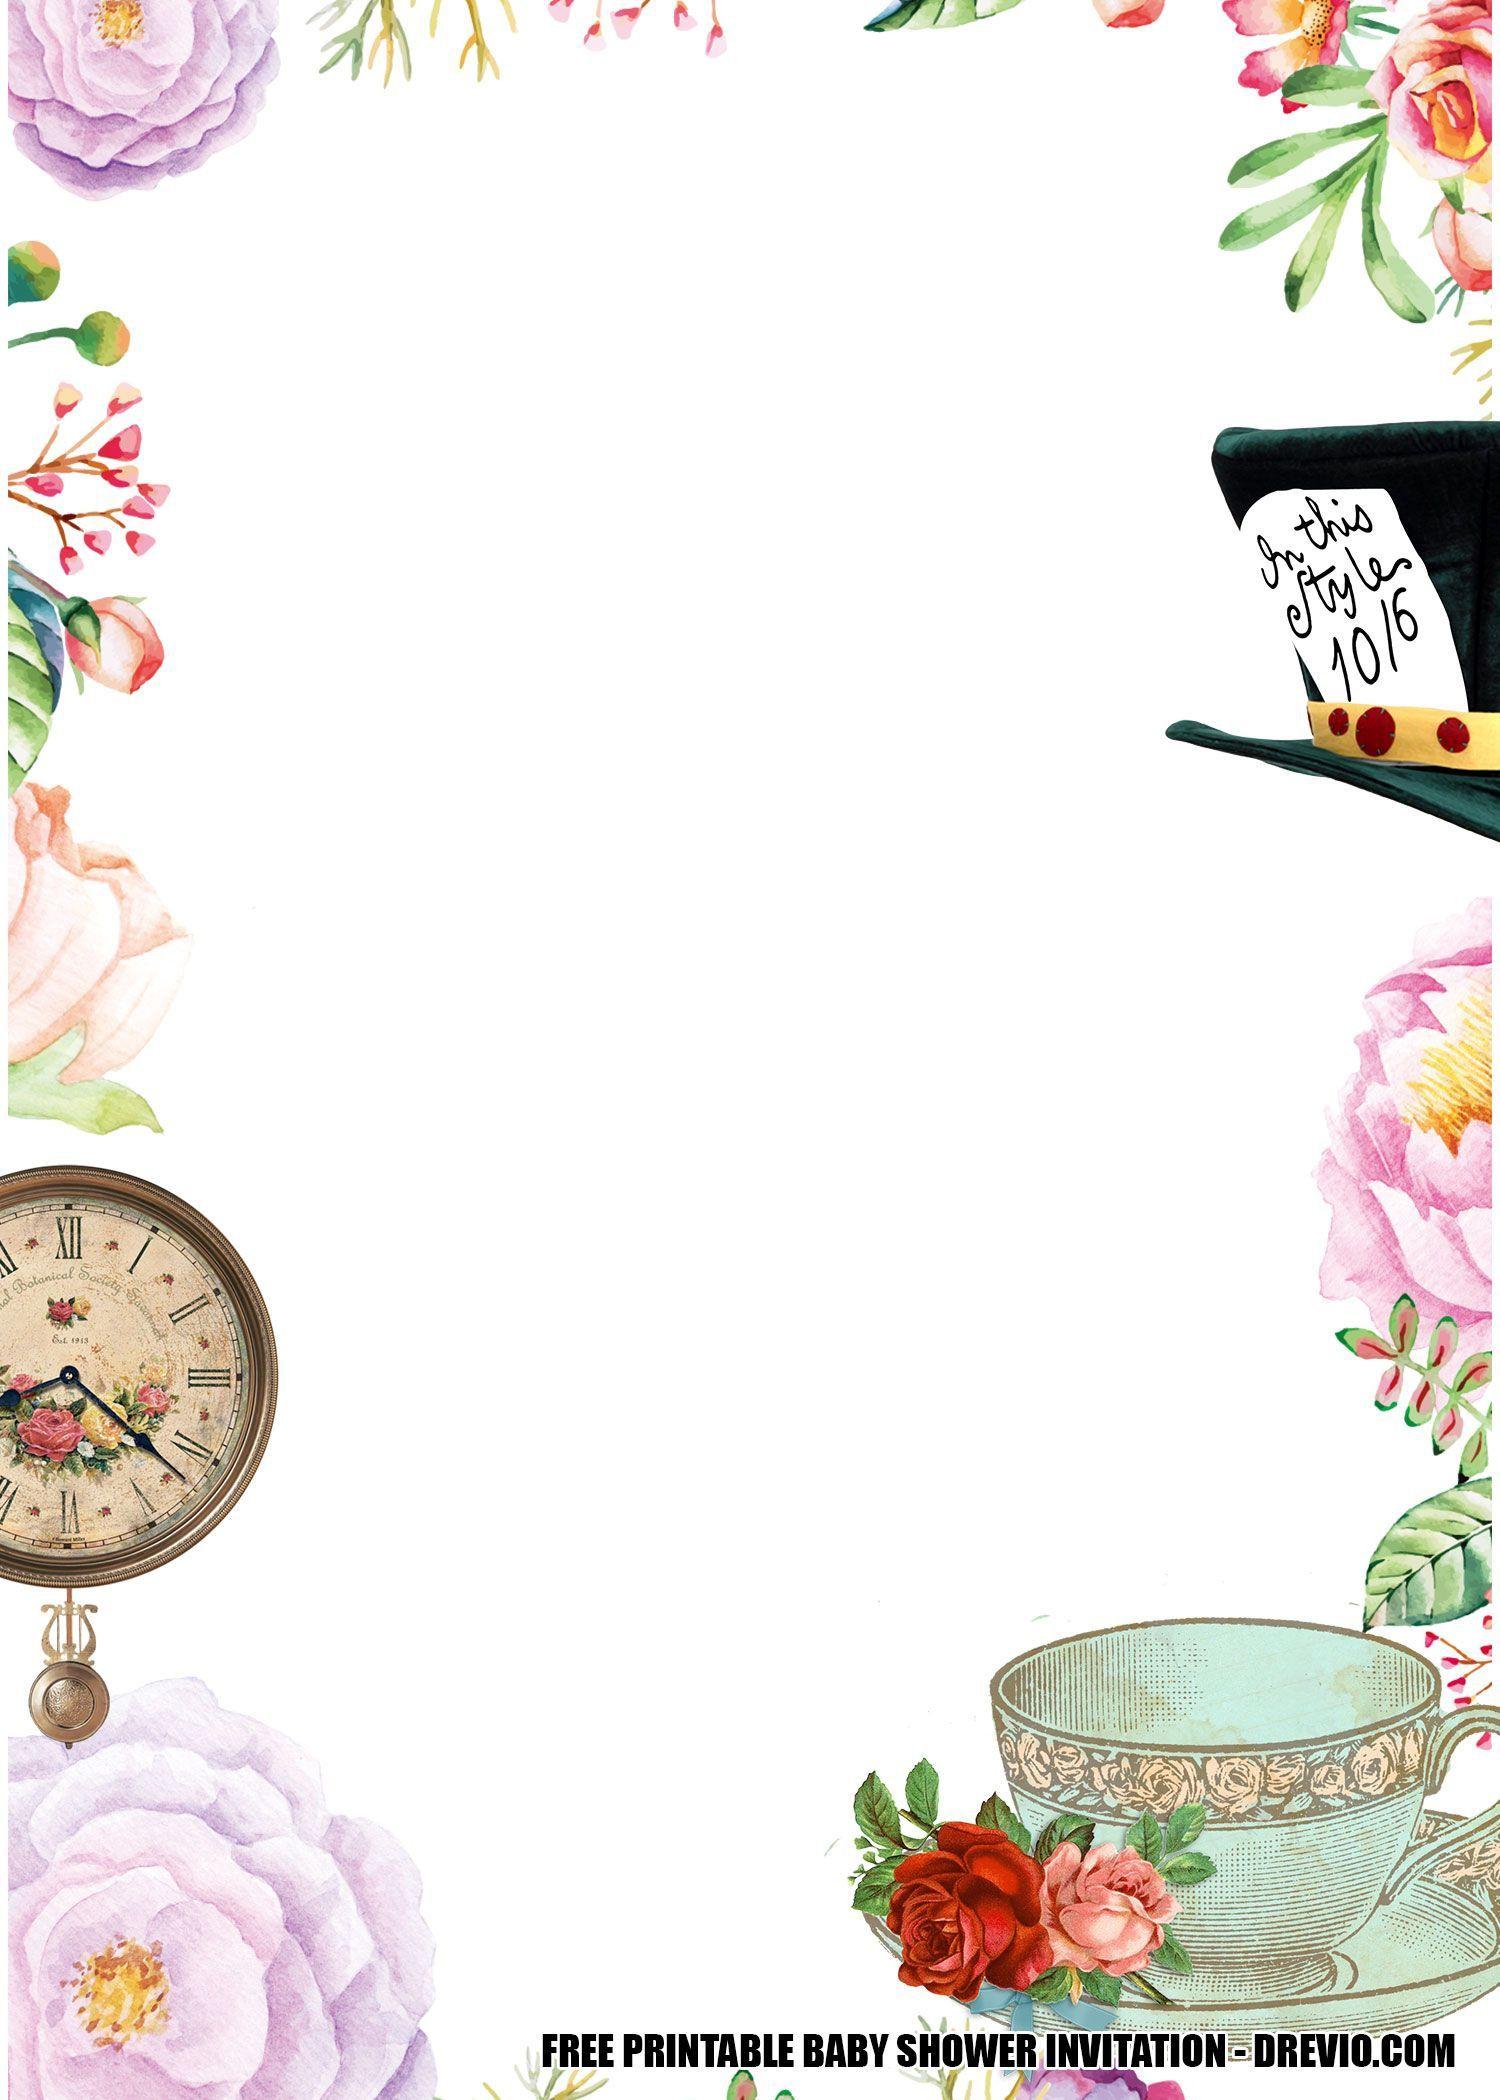 001 Impressive Alice In Wonderland Tea Party Template Idea  Templates Invitation FreeFull